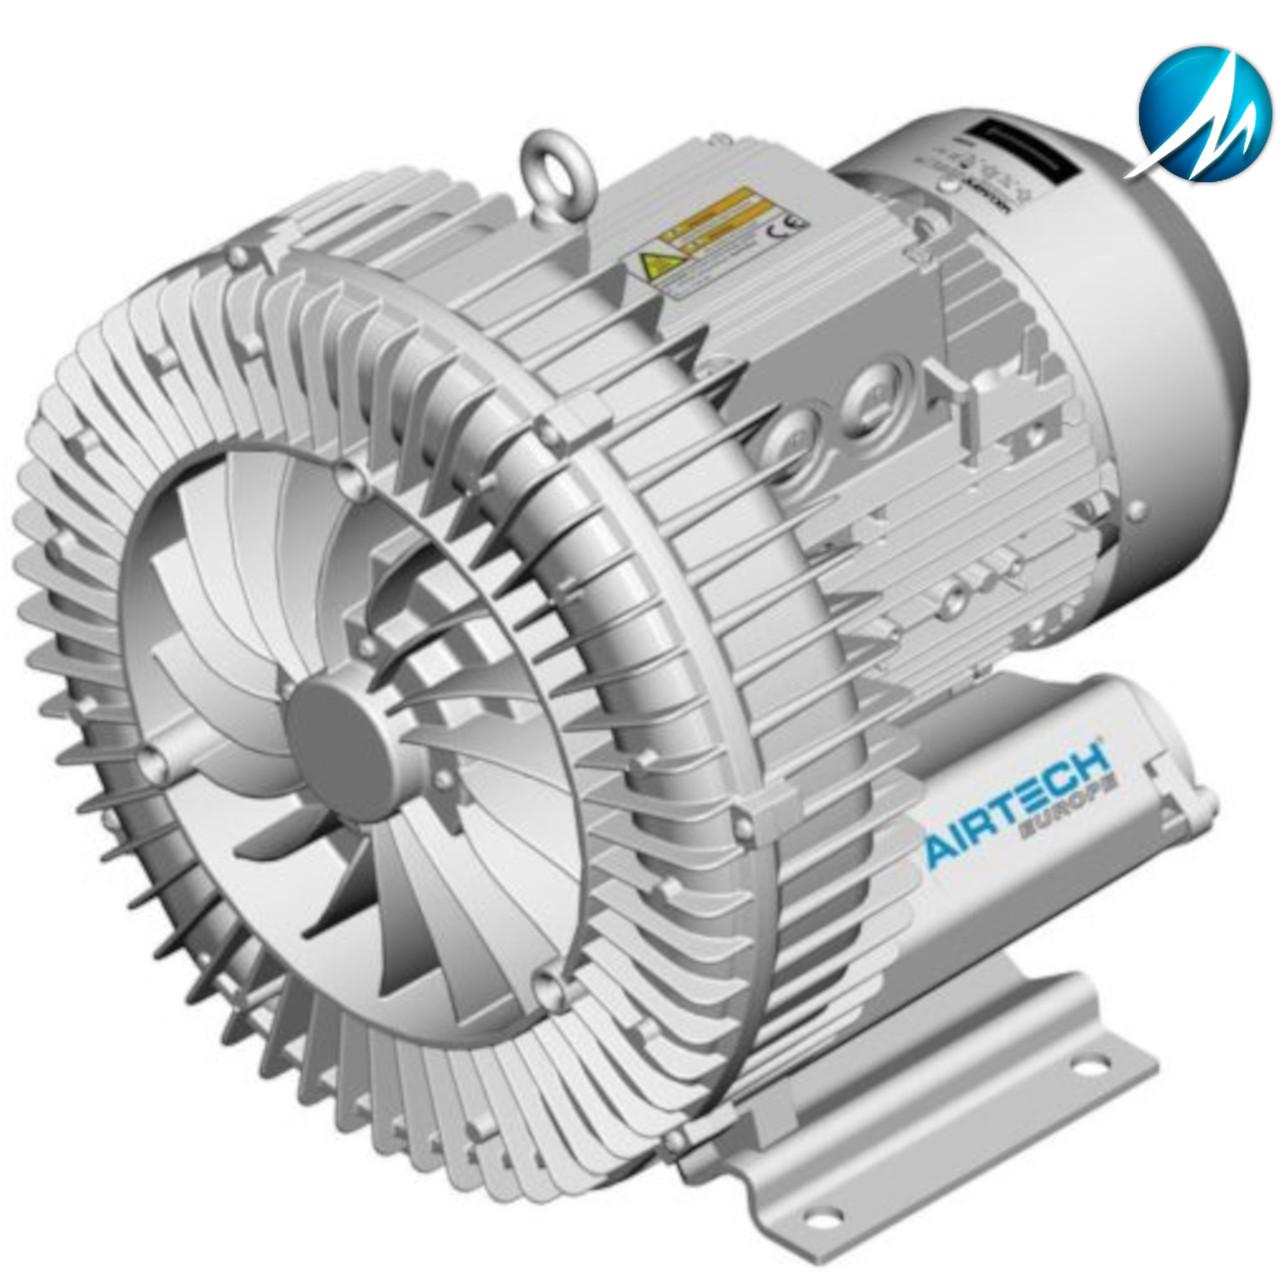 Компрессор HPE AIRTECH 0,25 кВт (70 м³/час, 110 мБар, 220 В)